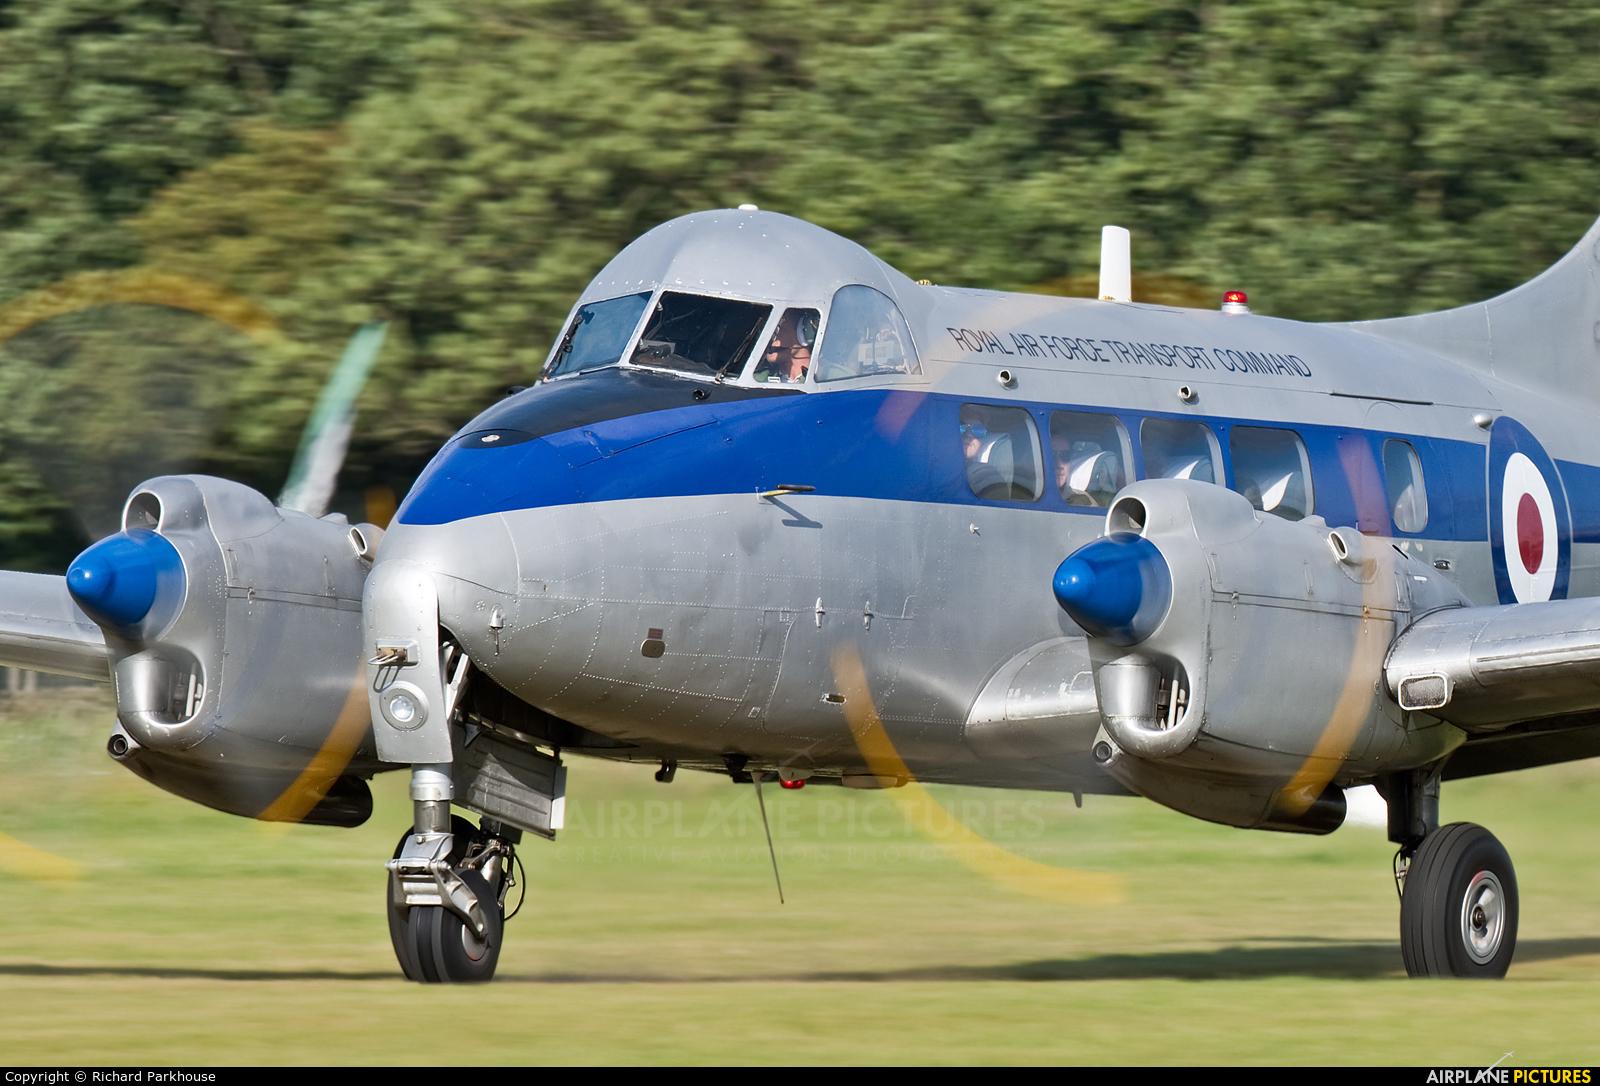 Aero Legends G-DHDV aircraft at Lashenden / Headcorn